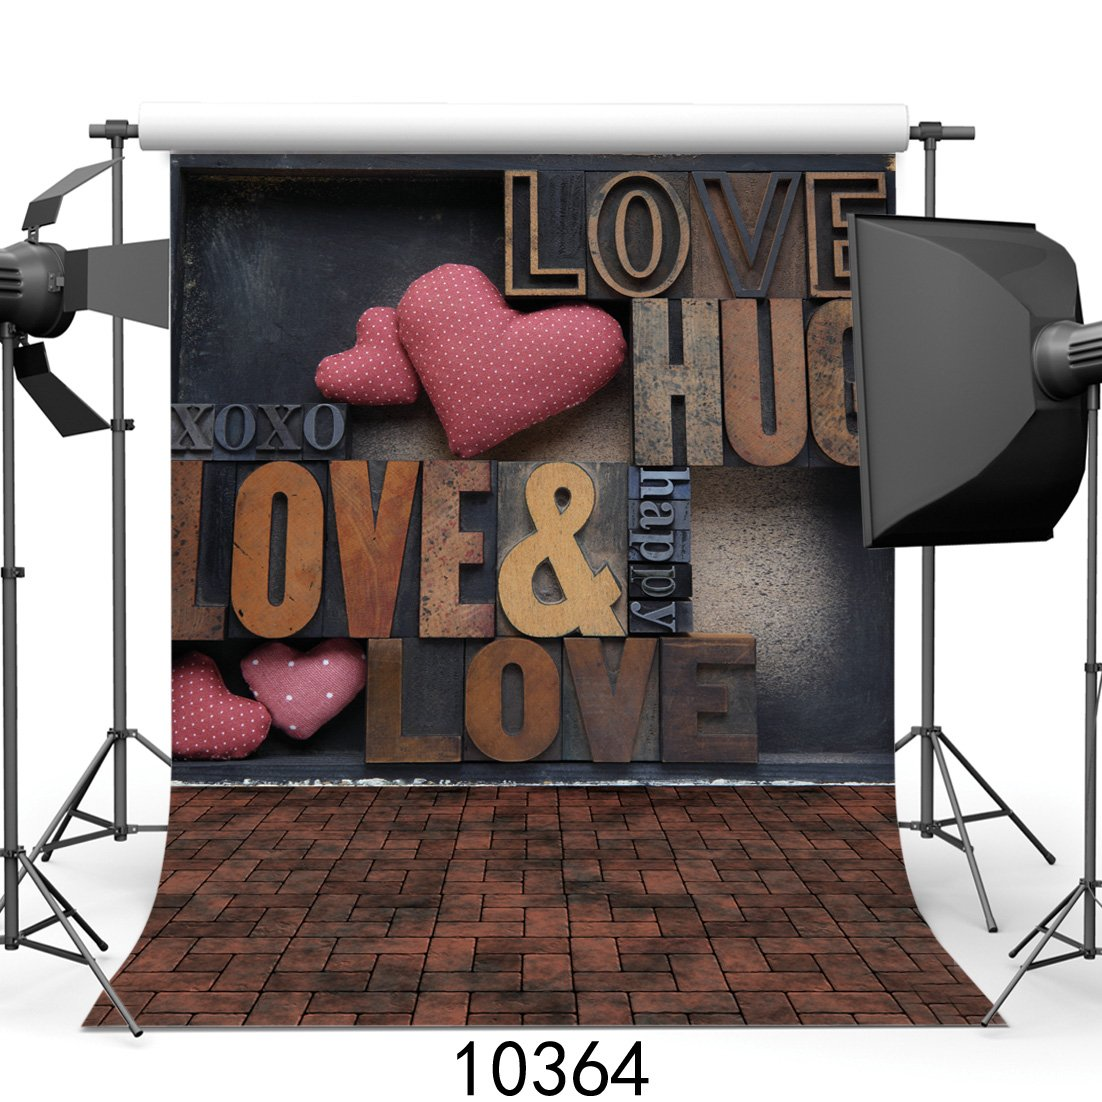 SJOLOON 10x10ft Wedding Background Pink Rose Heart Love Wood Floor Vinyl Photography Backdrop Valentine's Day JLT10364 Shengjiulong JLT-10364